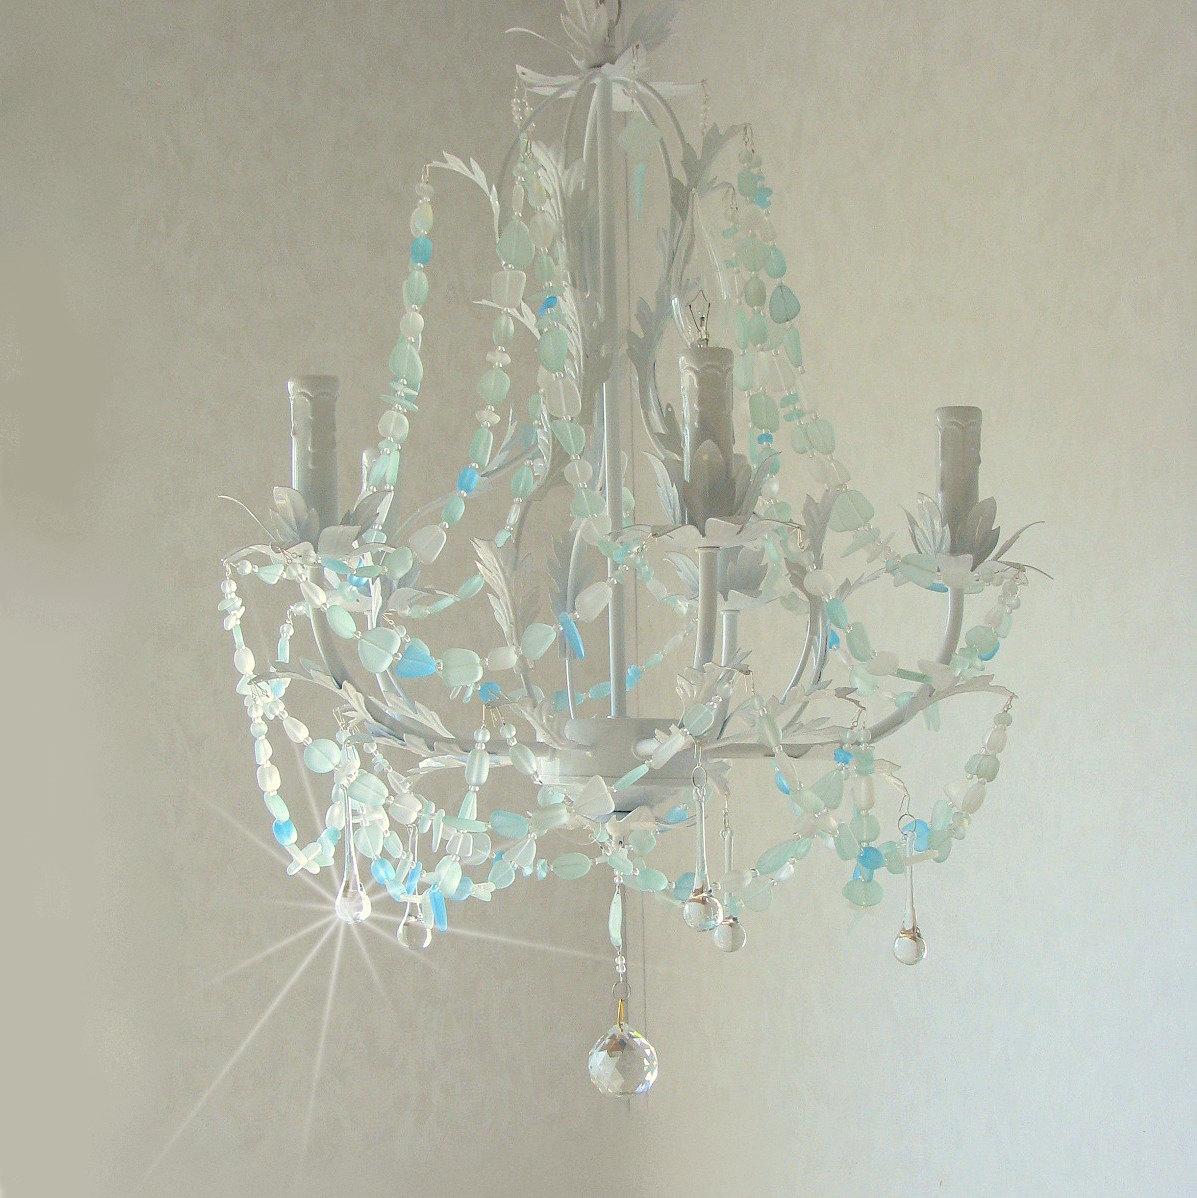 Sea glass chandelier lighting beach cottage chic coastal decor for Beach glass interior designs